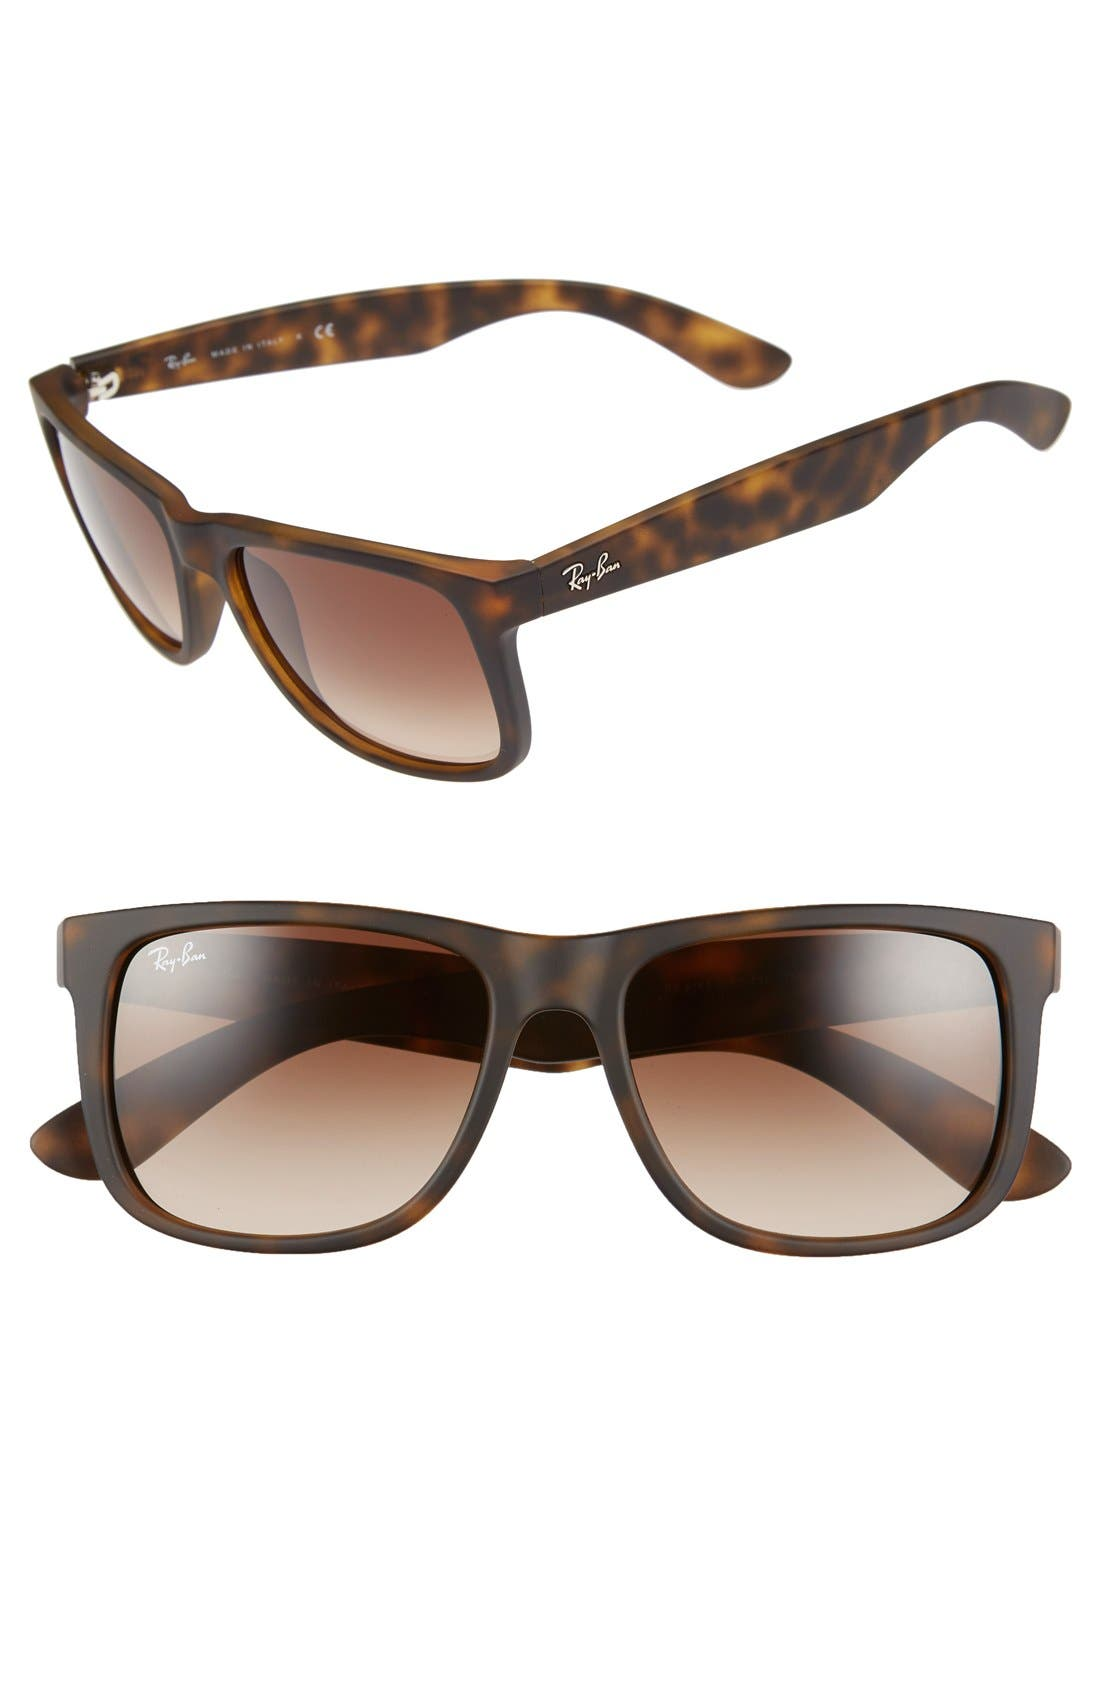 7833b14524b Ray-Ban  Justin Classic  5m Sunglasses -